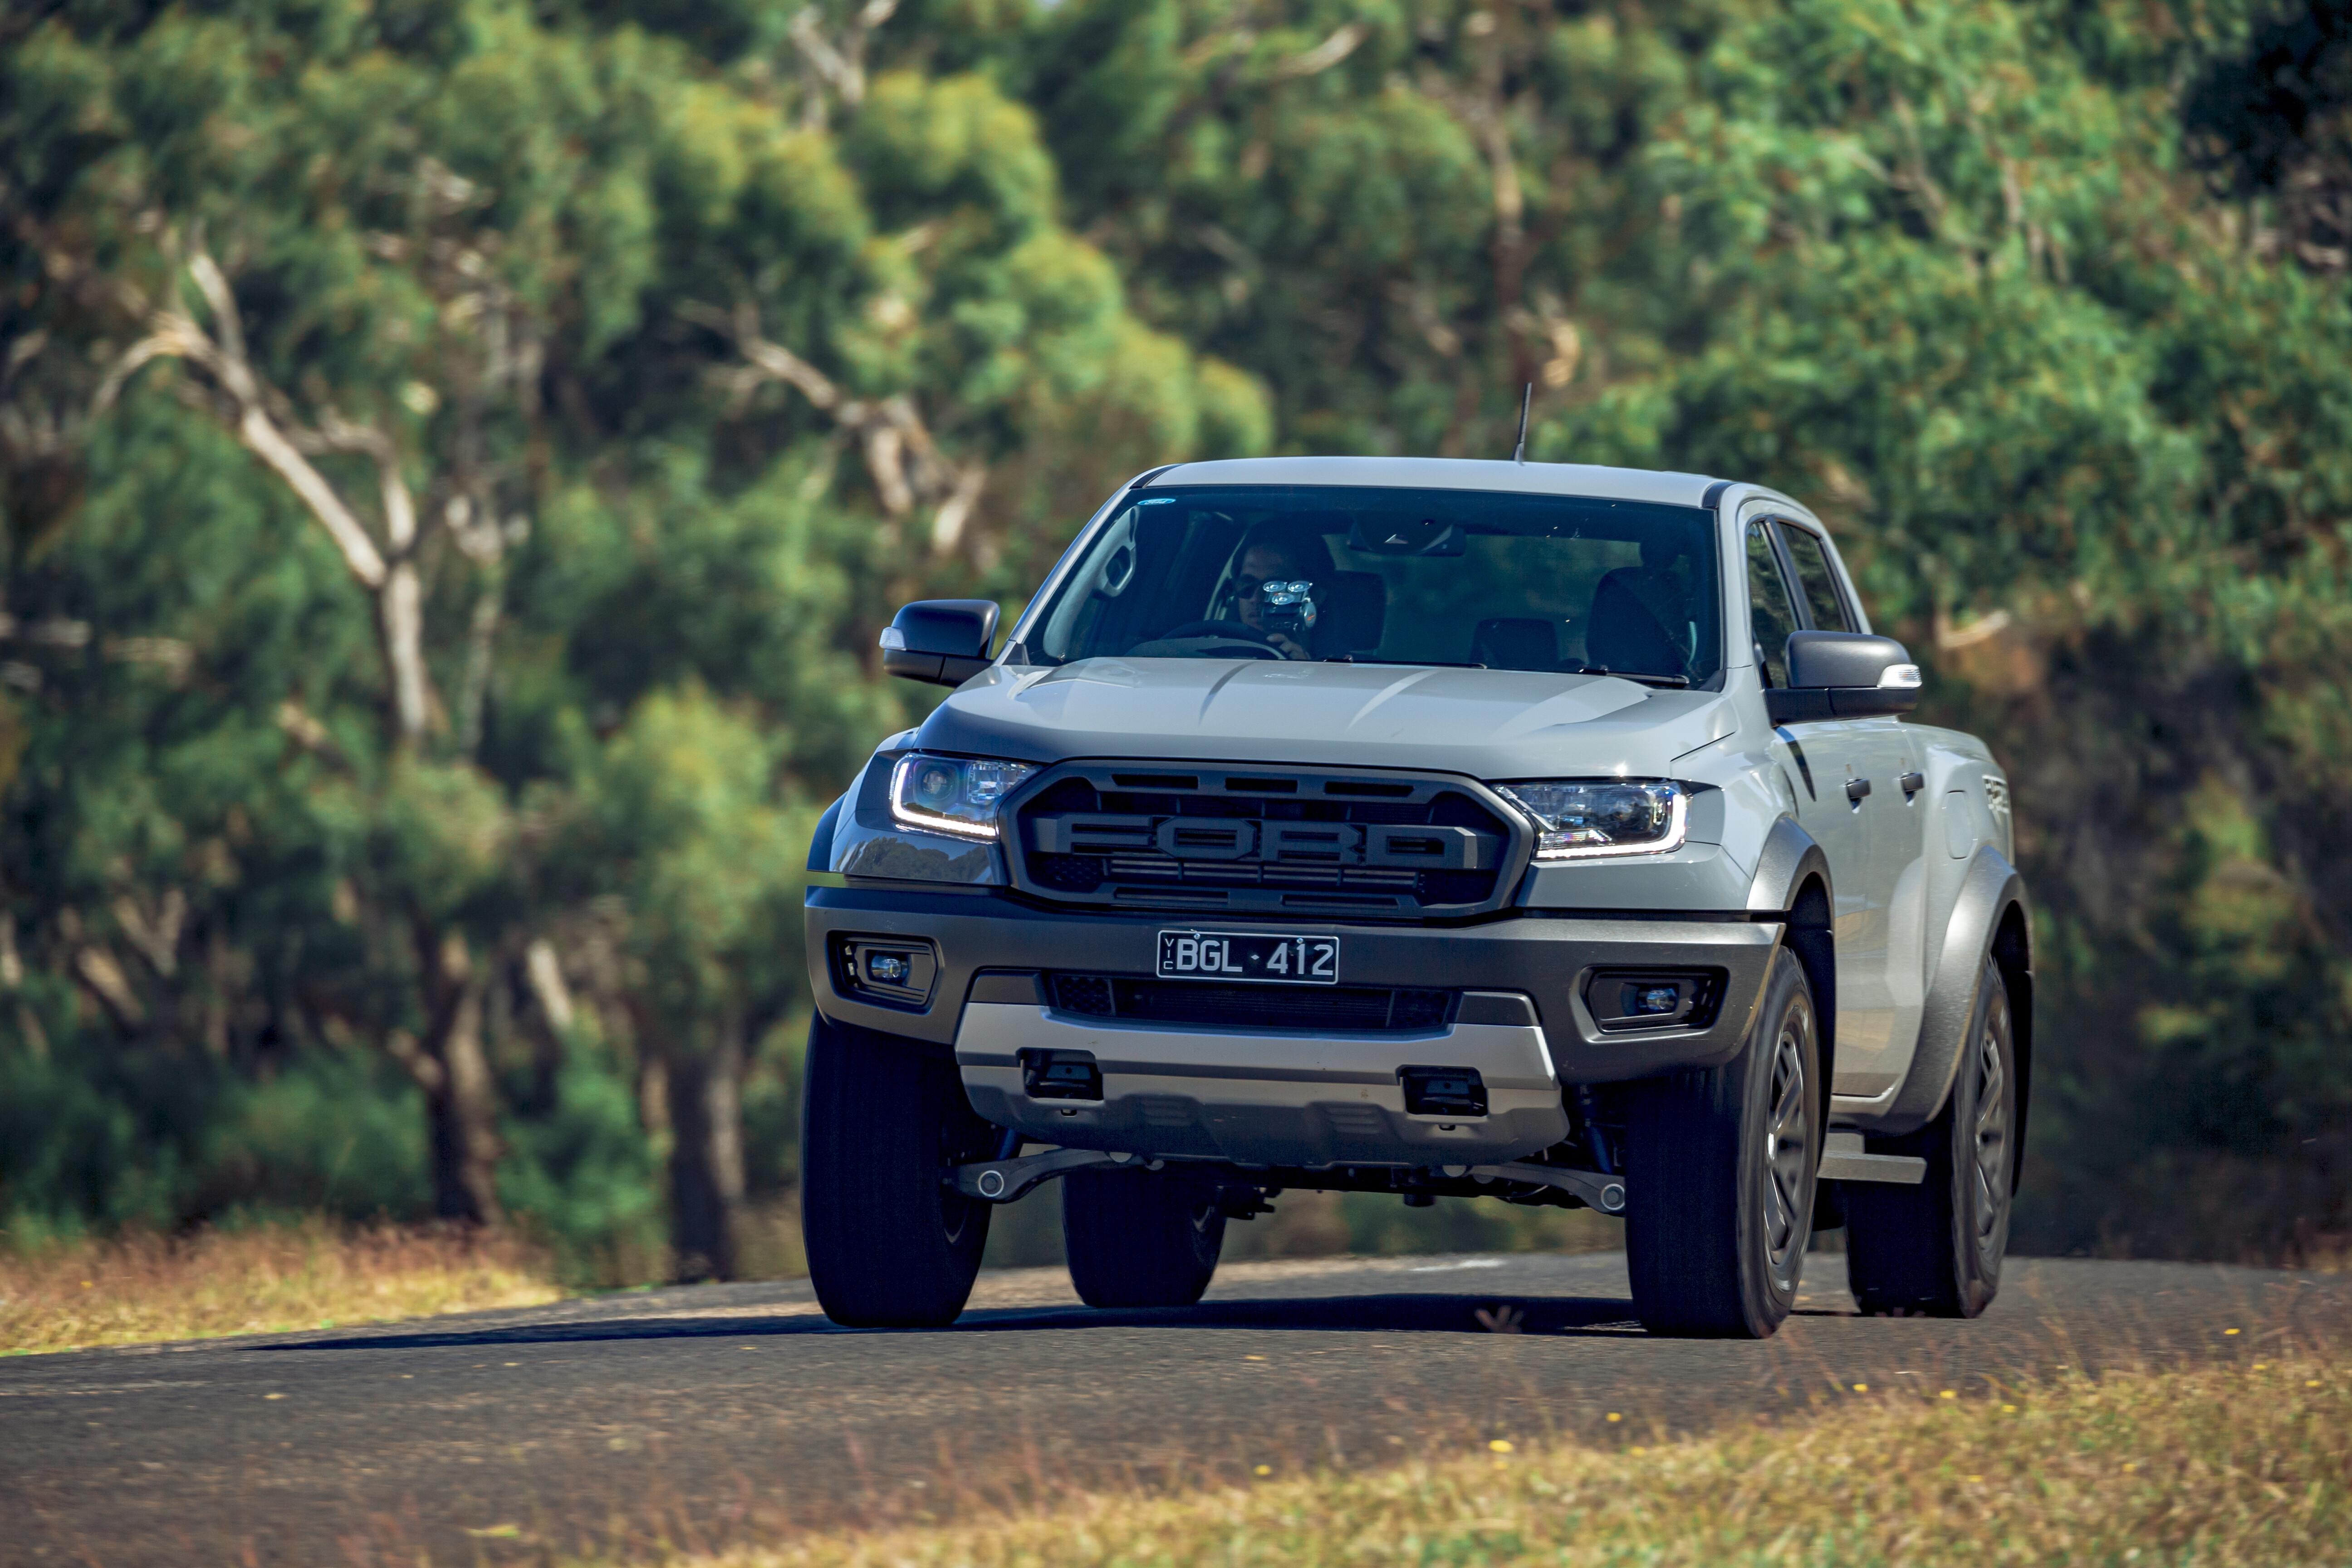 4 X 4 Australia Comparisons 2021 May 21 Ford Ranger Raptor Performance Road Handling